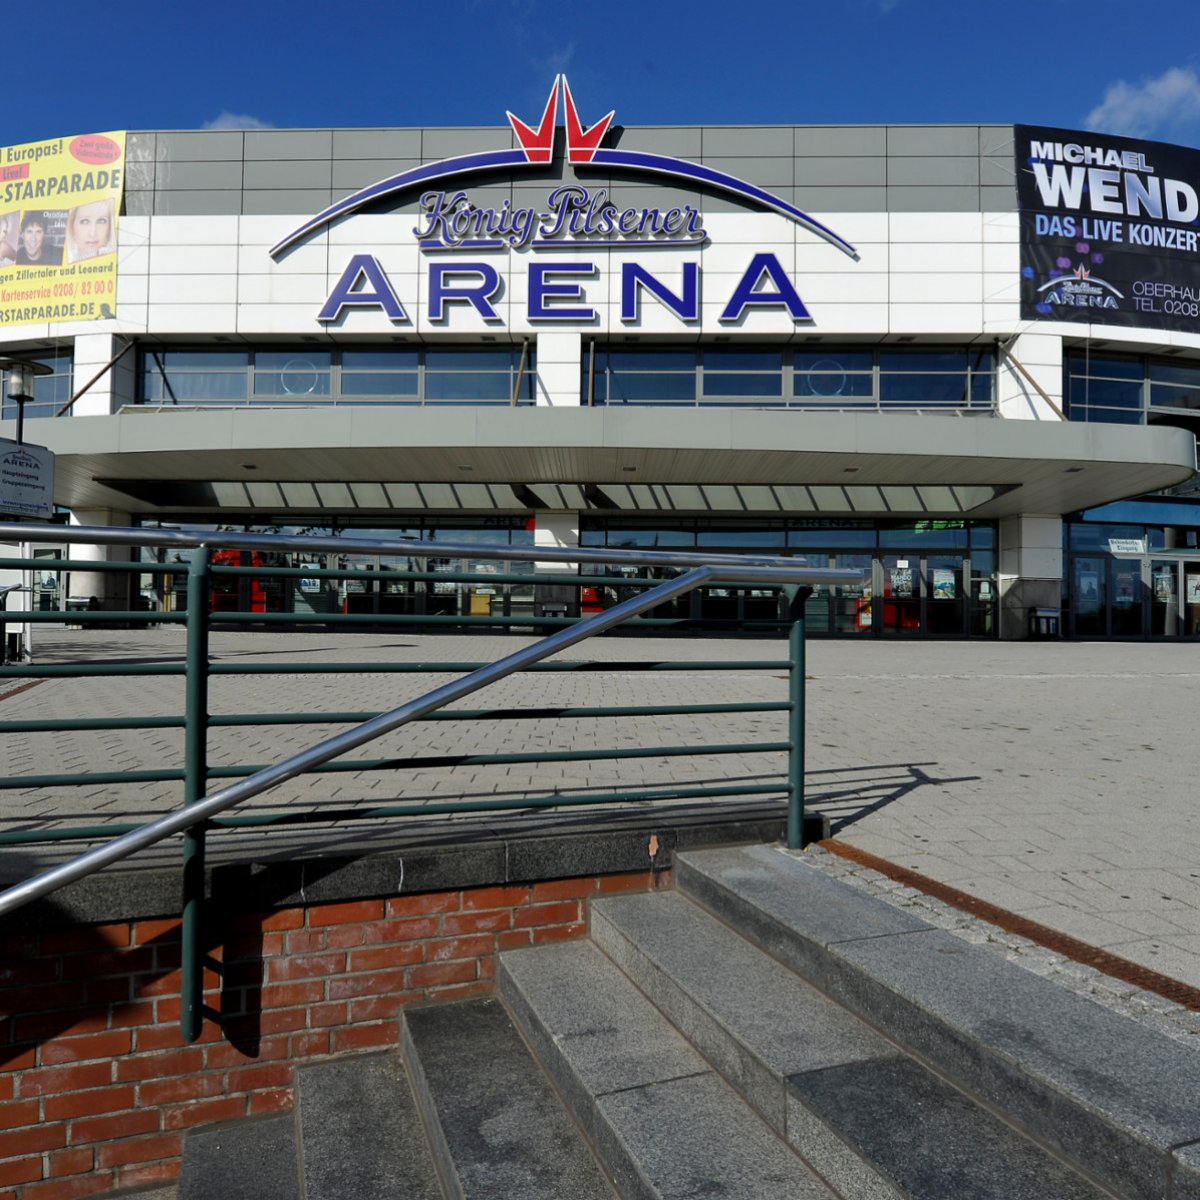 Sitzplätze oberhausen arena Vor deiner